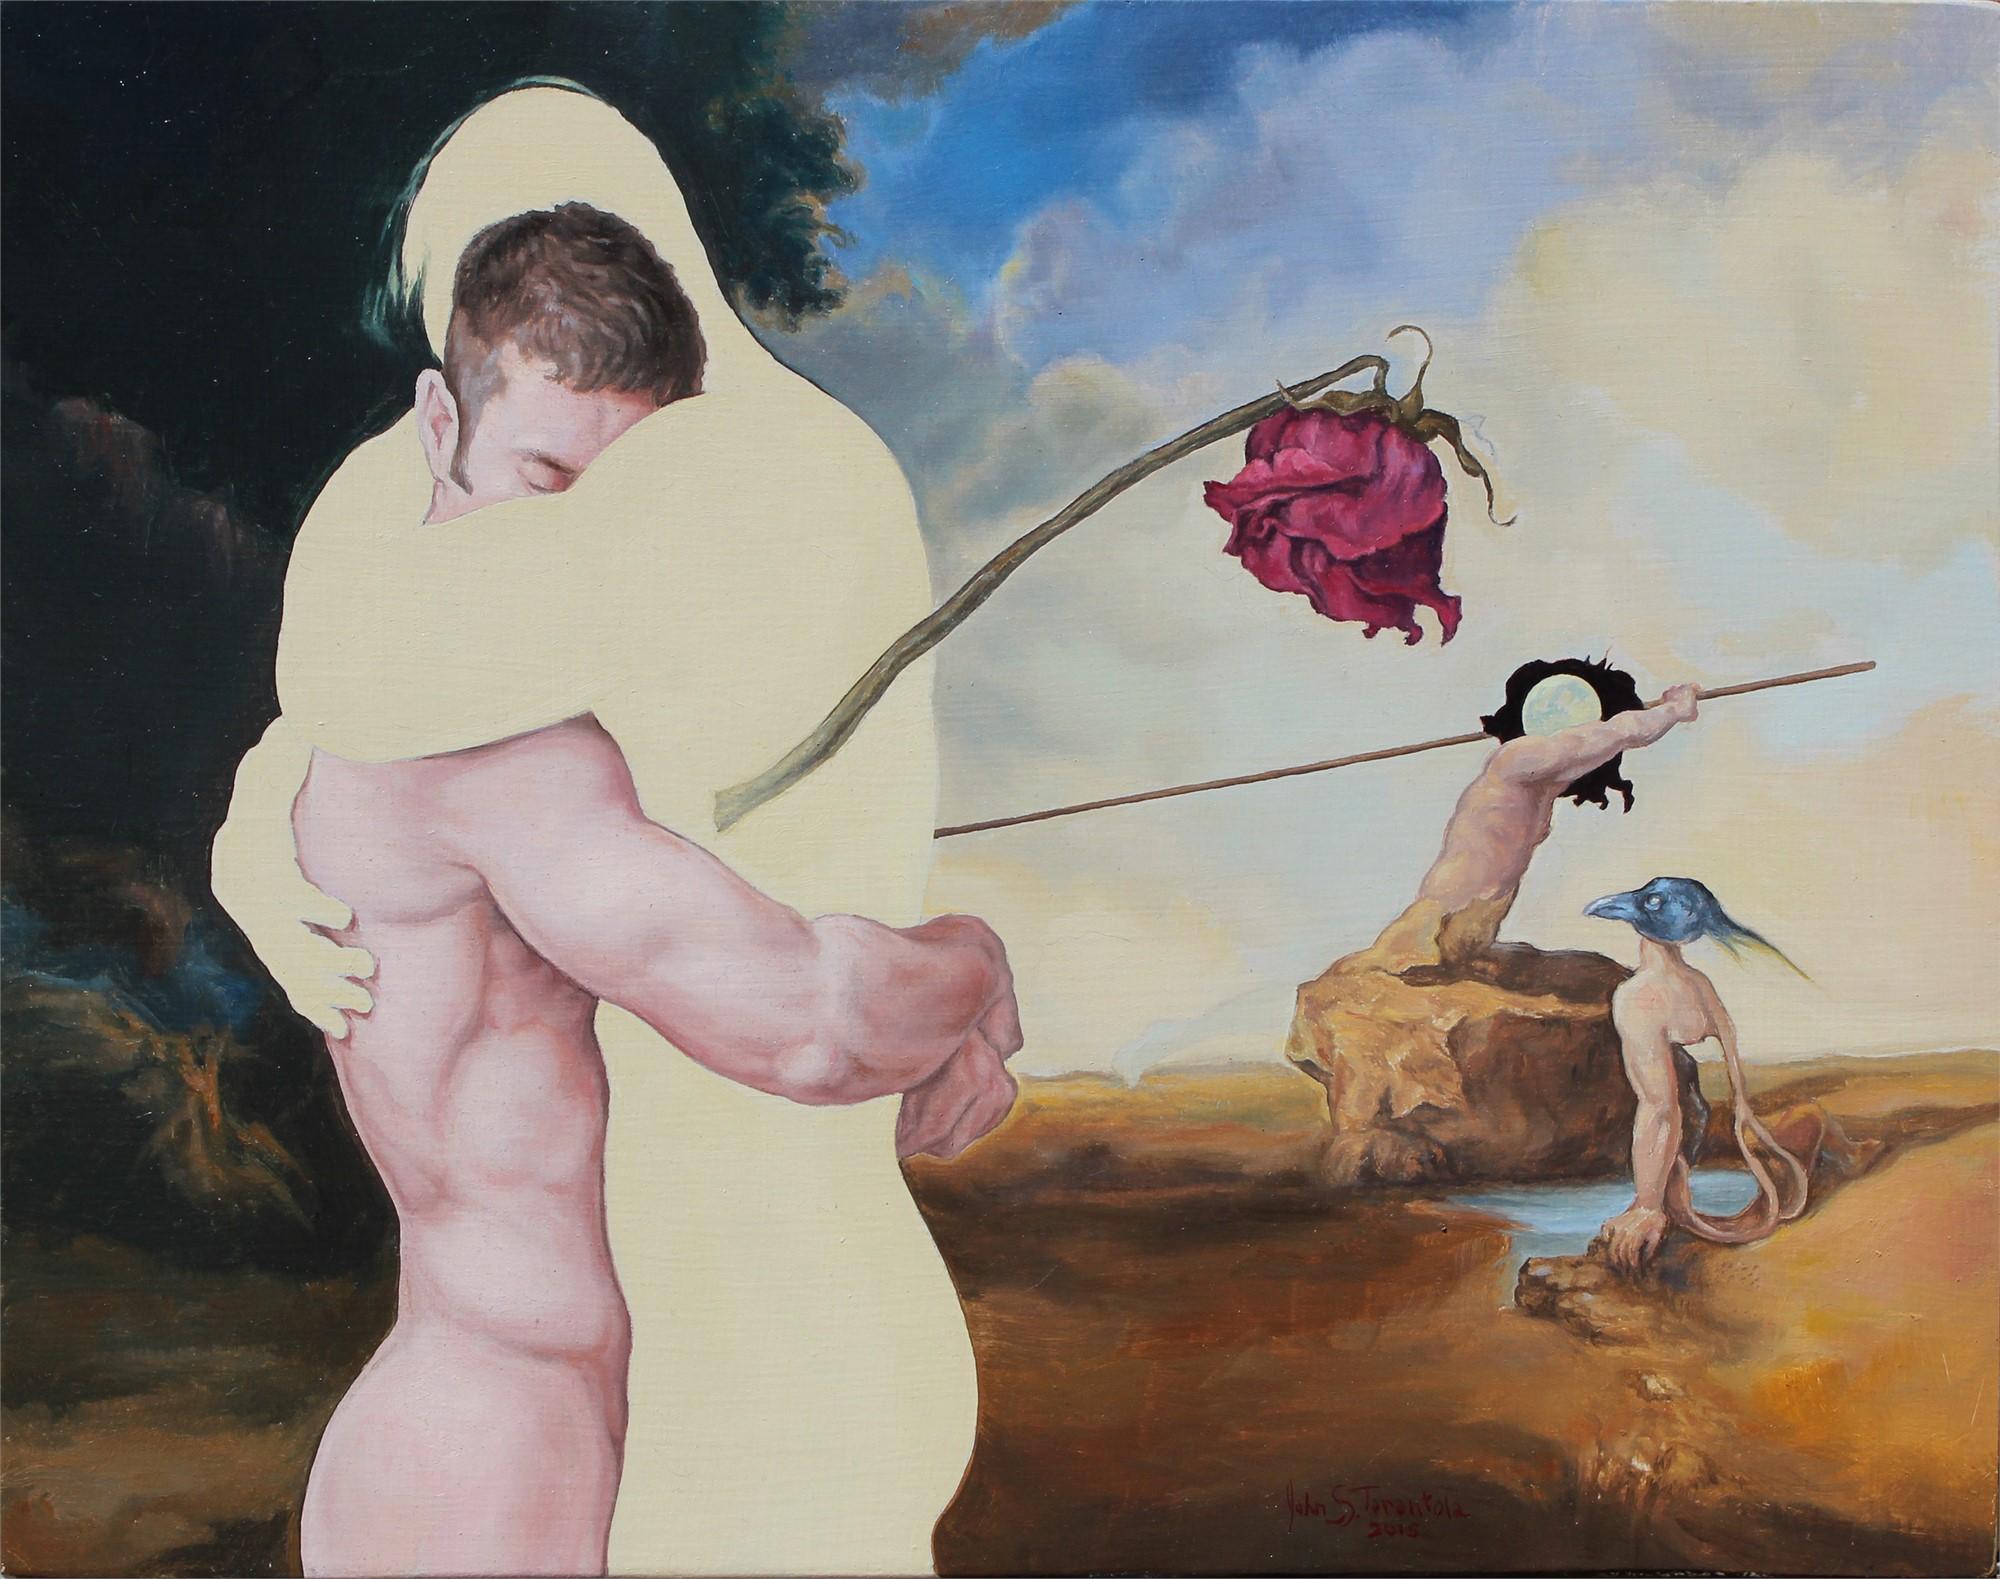 The Embrace by John Tarantola